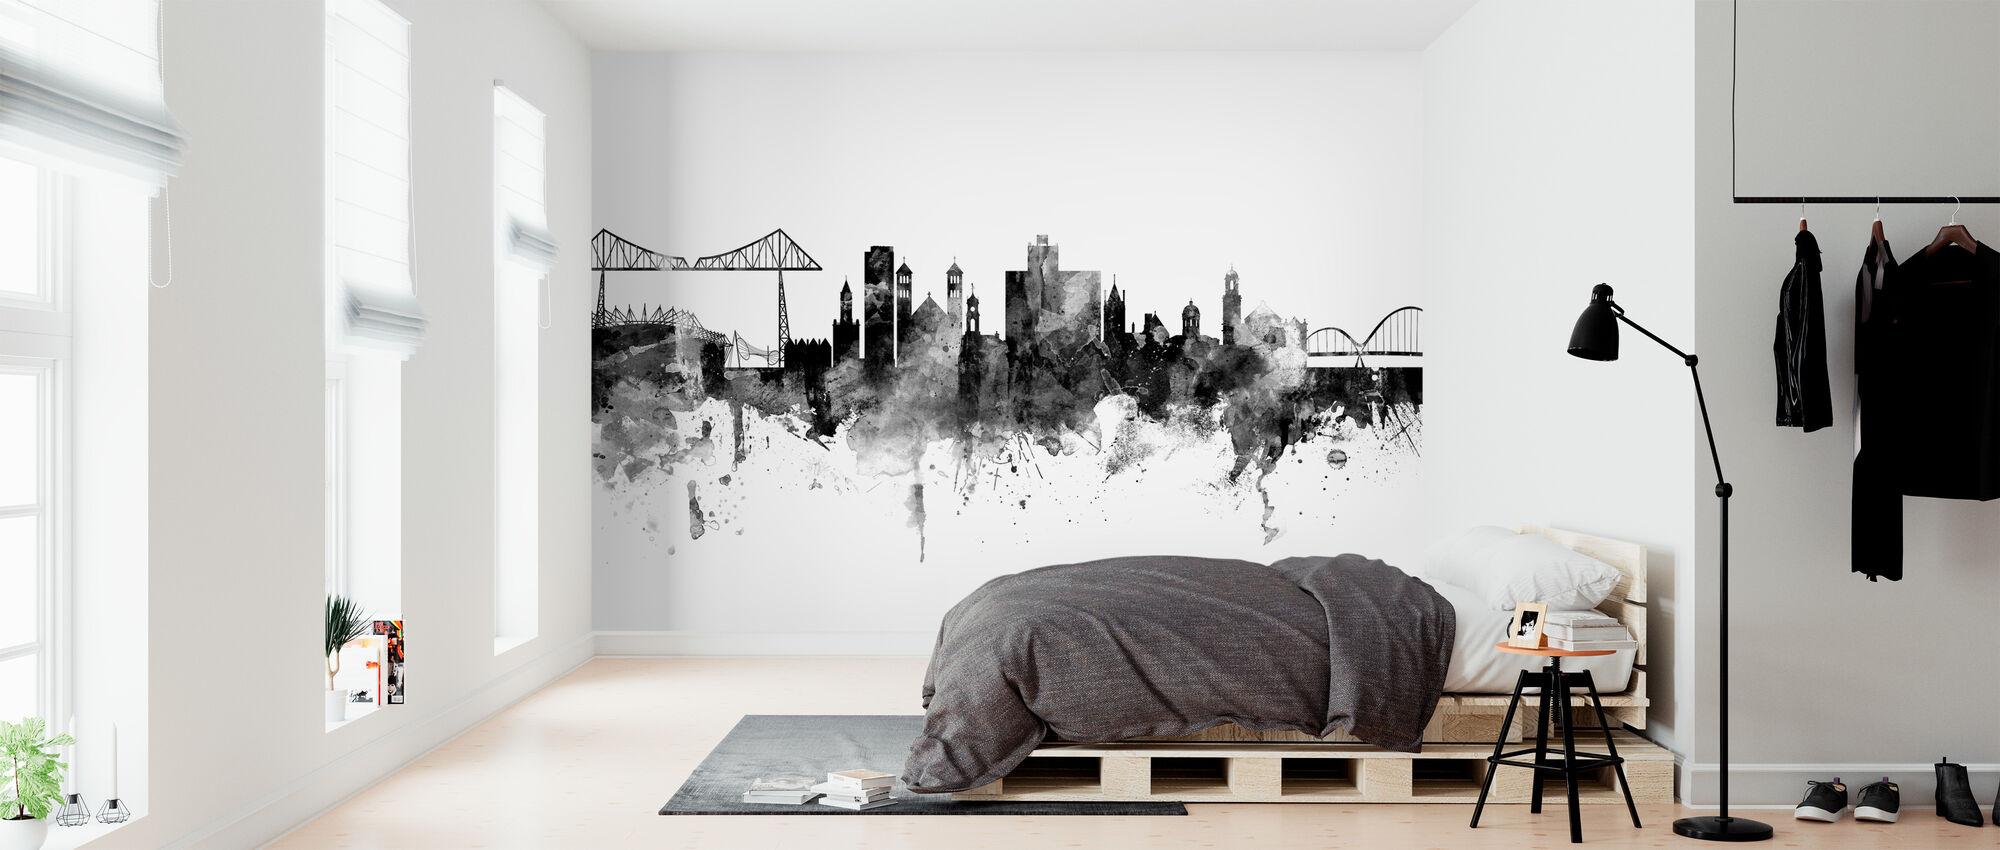 Middlesbrough Skyline, black and white - Wallpaper - Bedroom